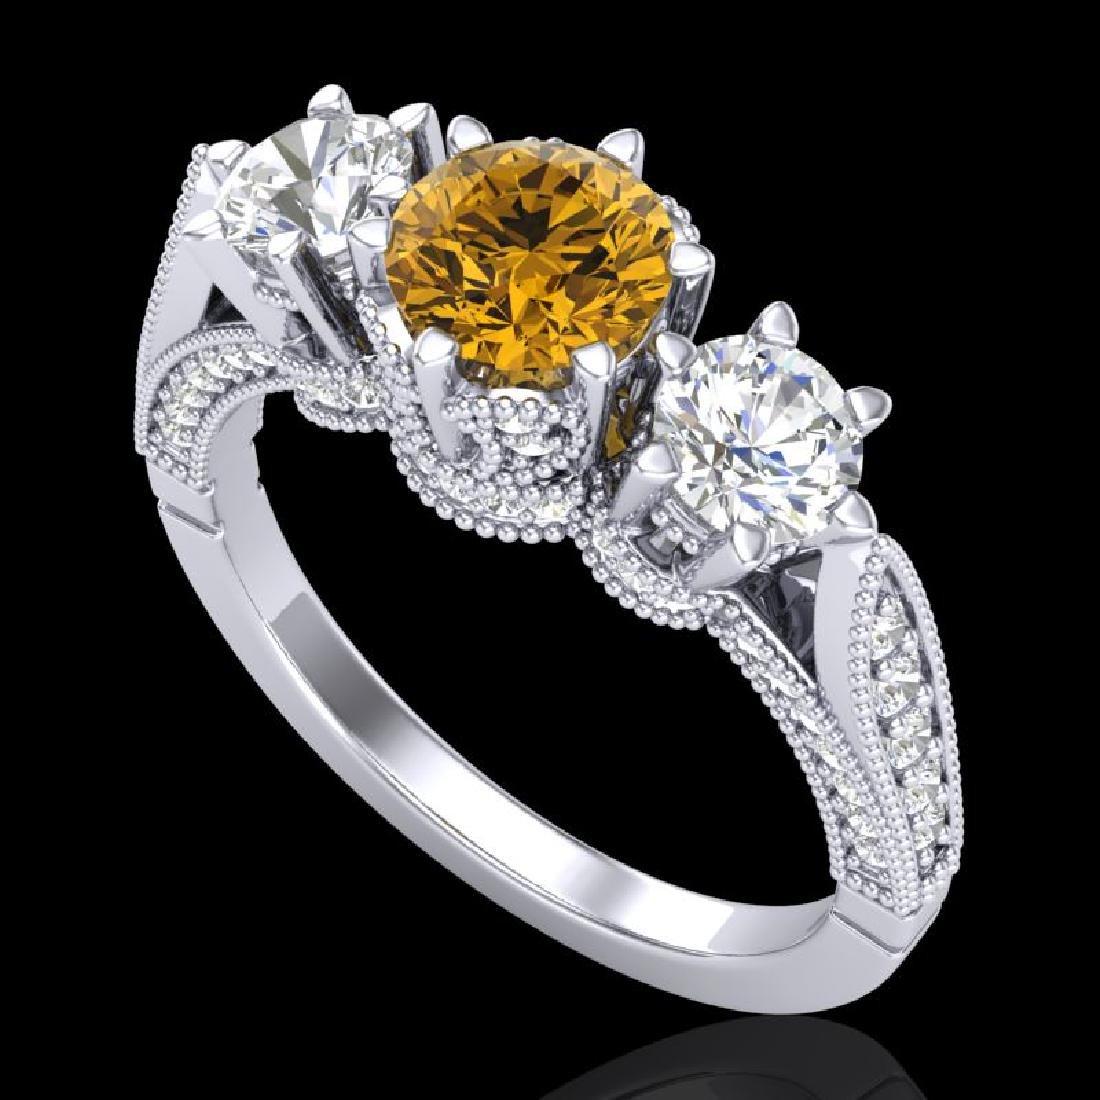 2.18 CTW Intense Fancy Yellow Diamond Art Deco 3 Stone